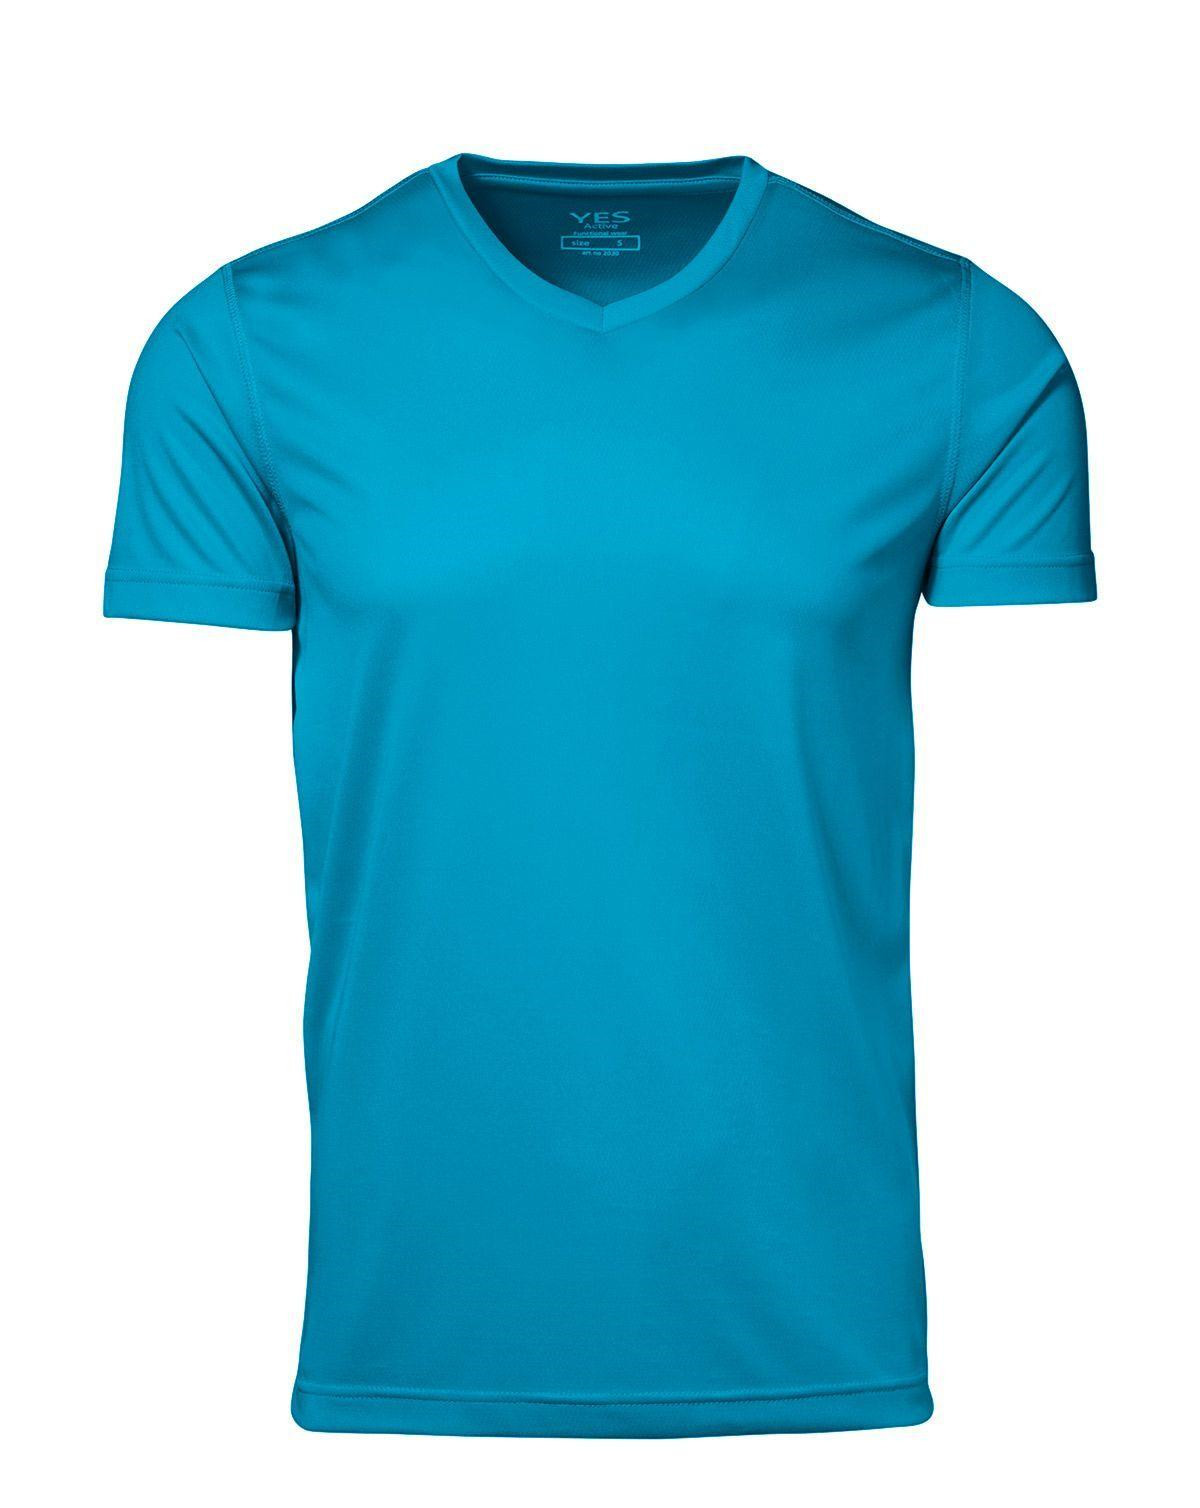 ID YES Svedtransporterende T-shirt (Cyan, 2XL)